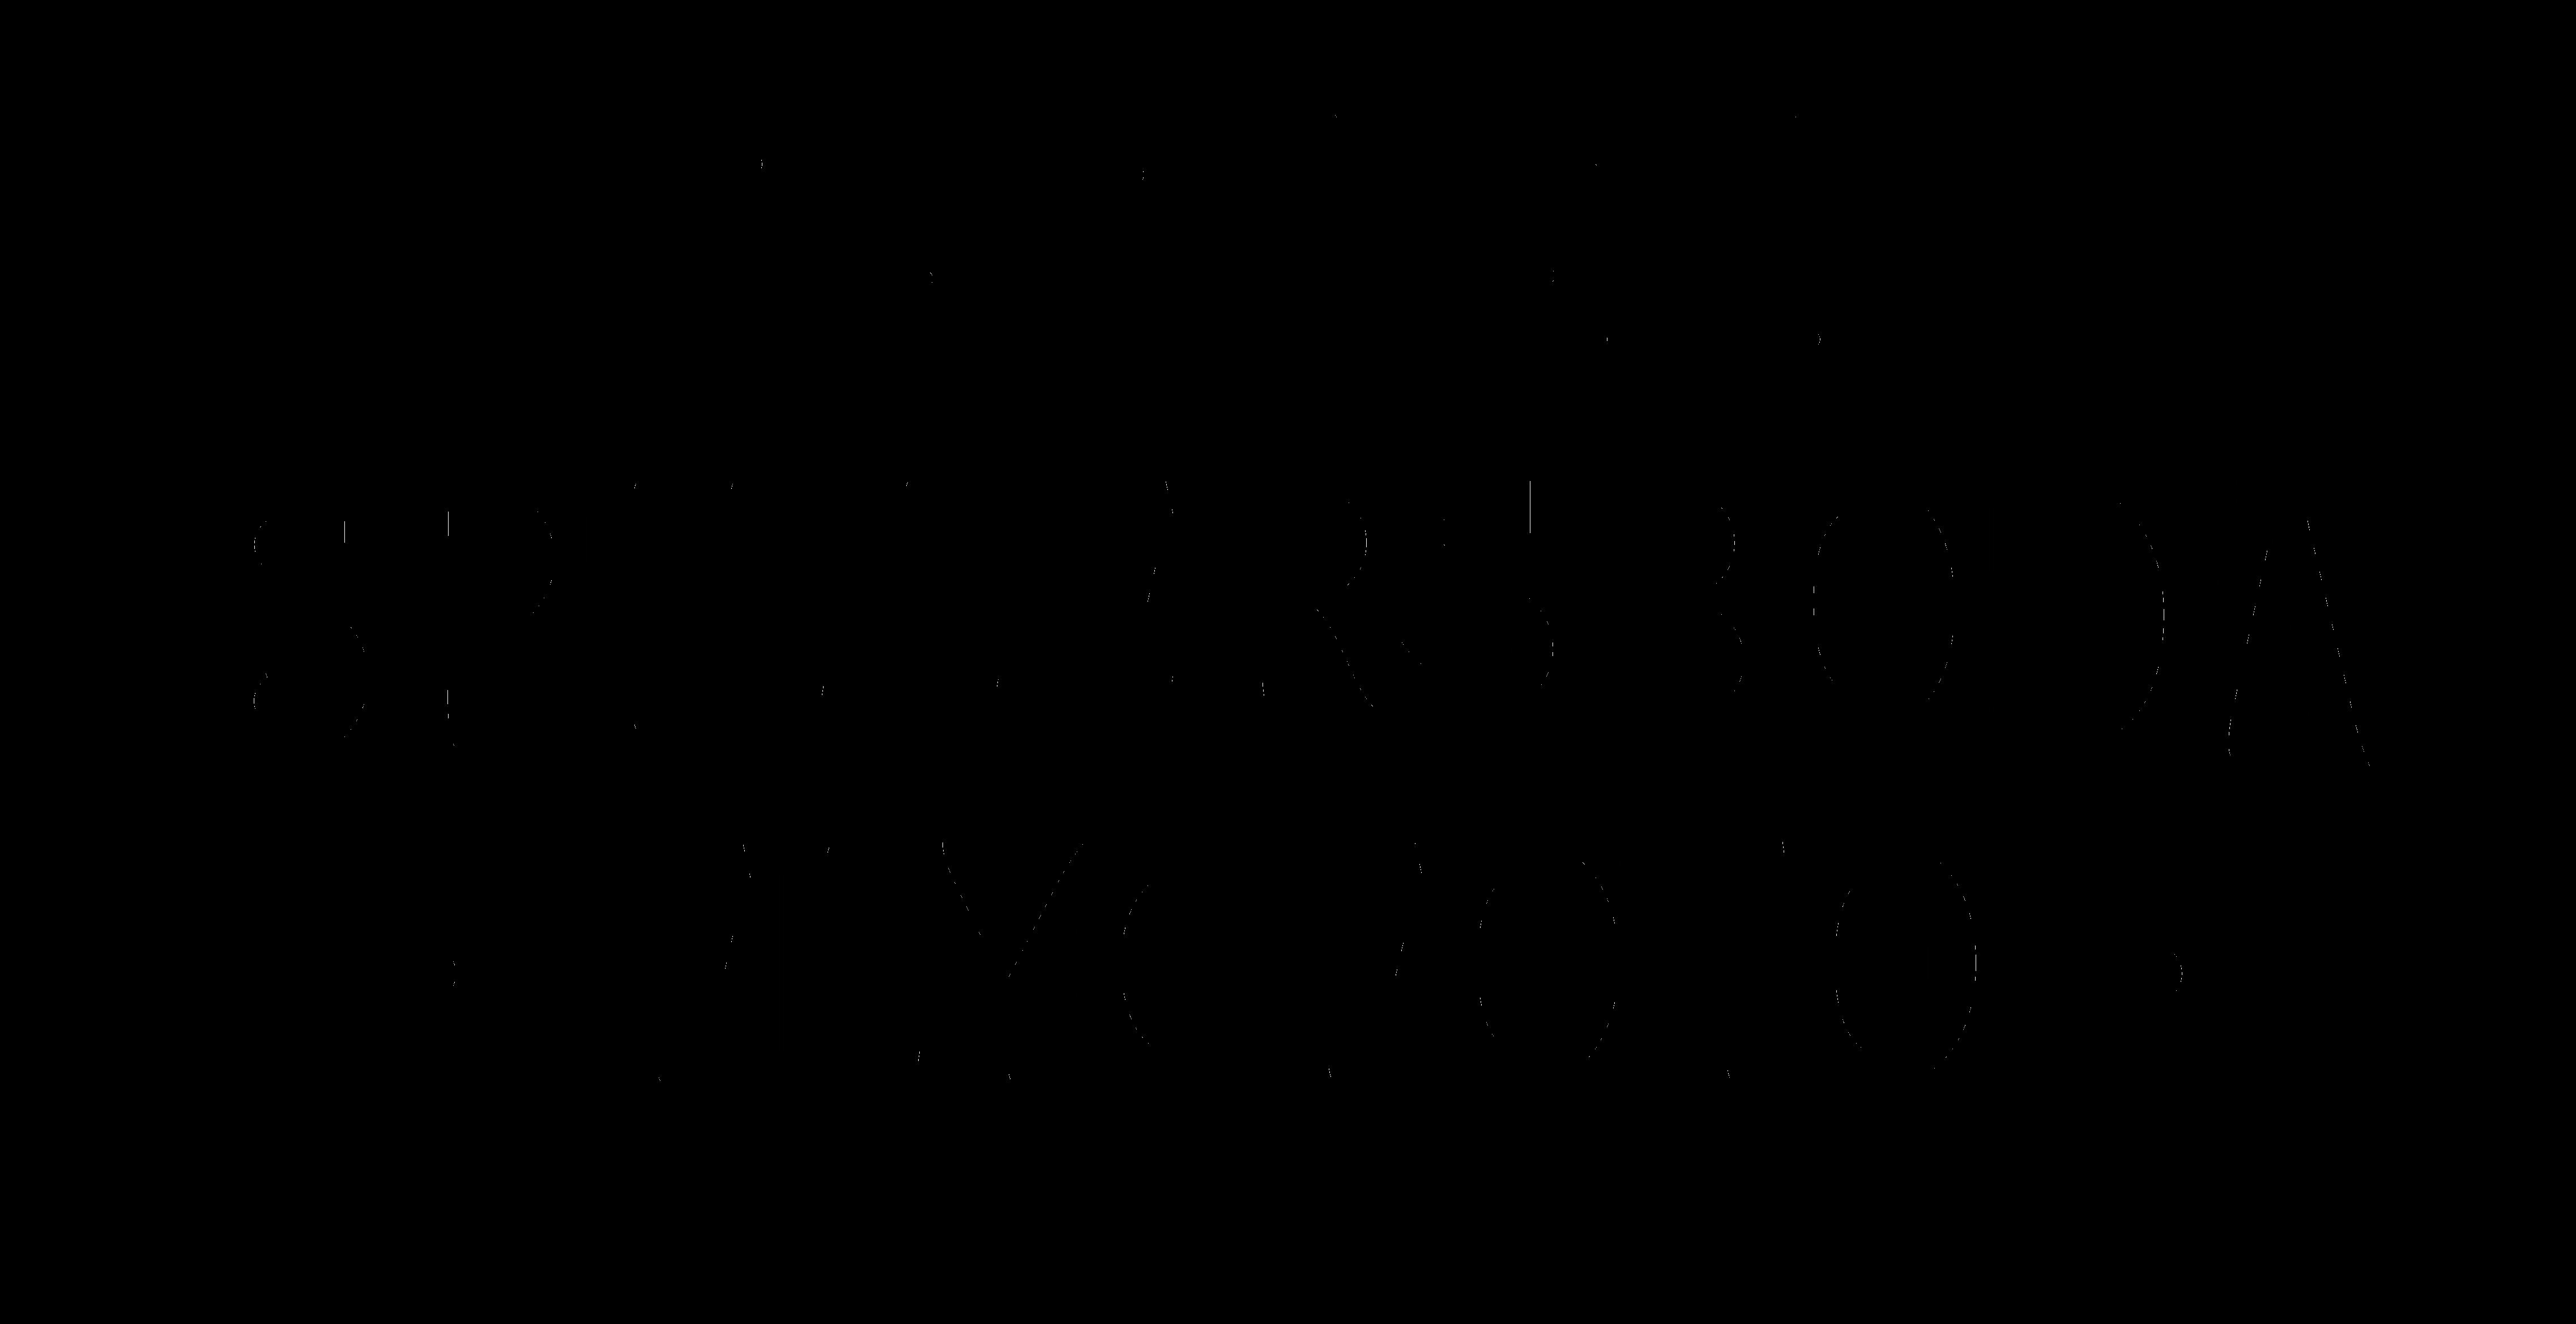 spillersboda flygfoto